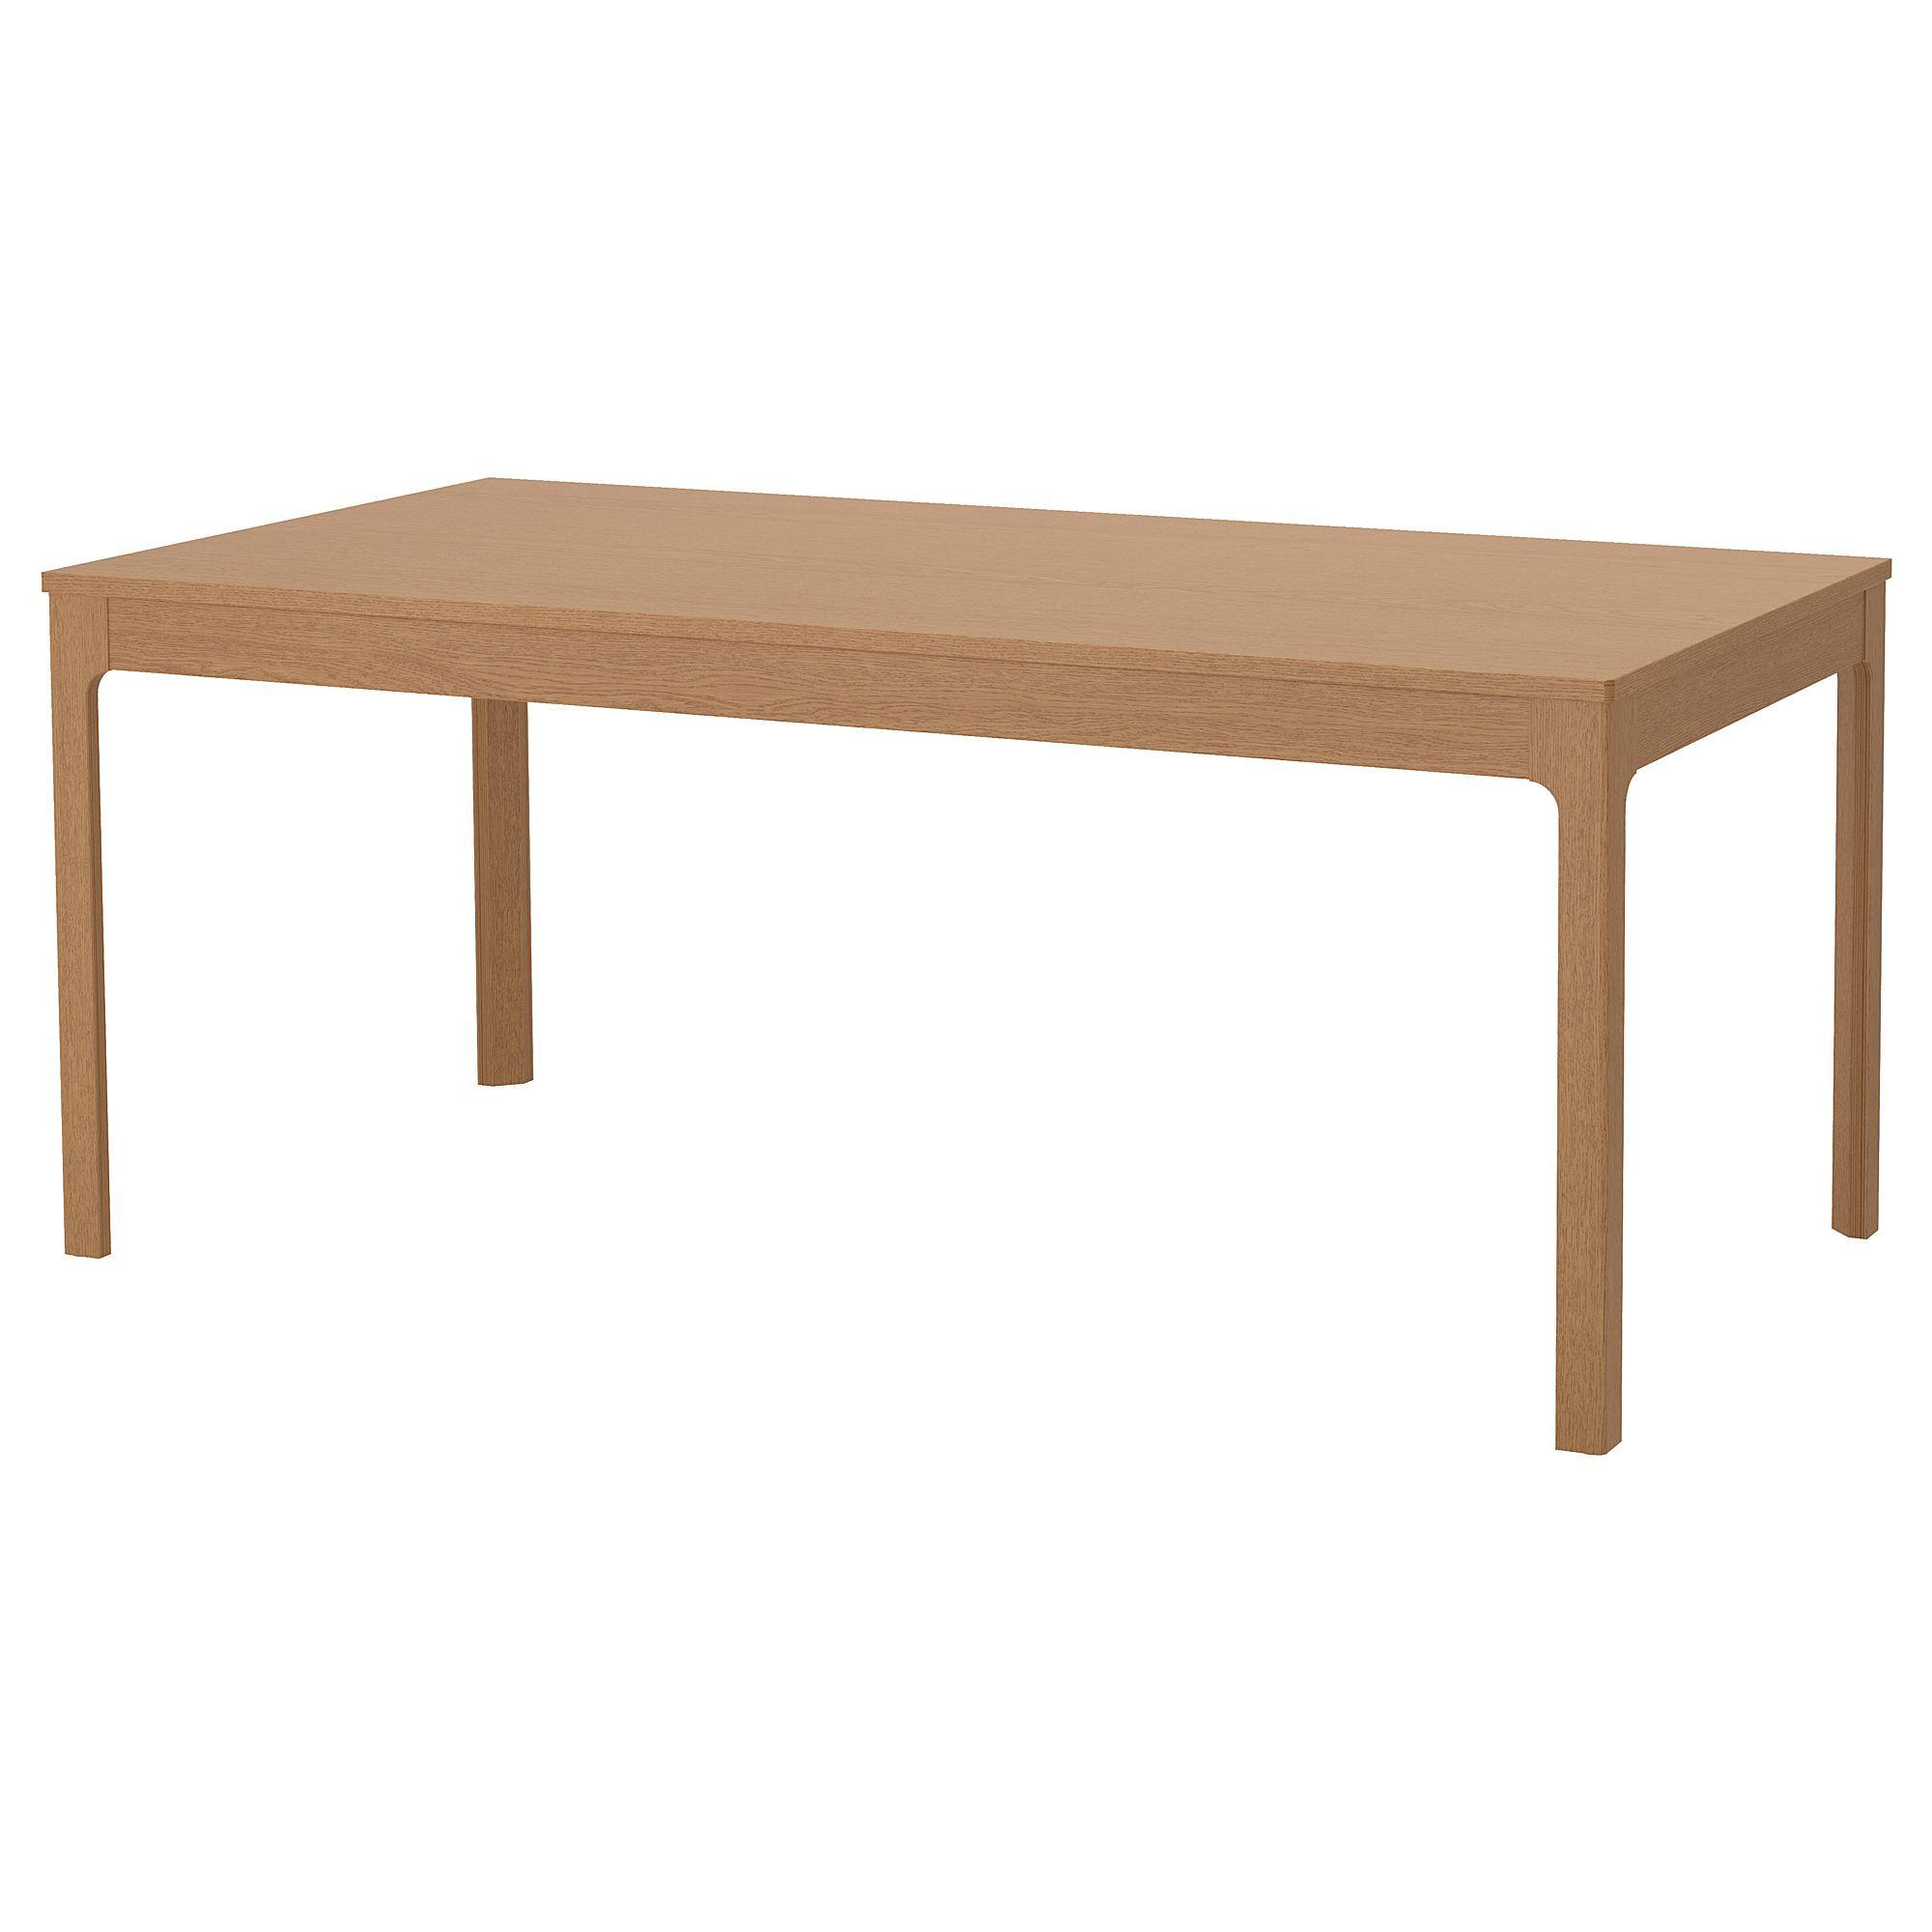 Tavoli Allungabili Da Esterno Ikea.Ekedalen Tavolo Allungabile Rovere 180 240x90 Cm Mobili